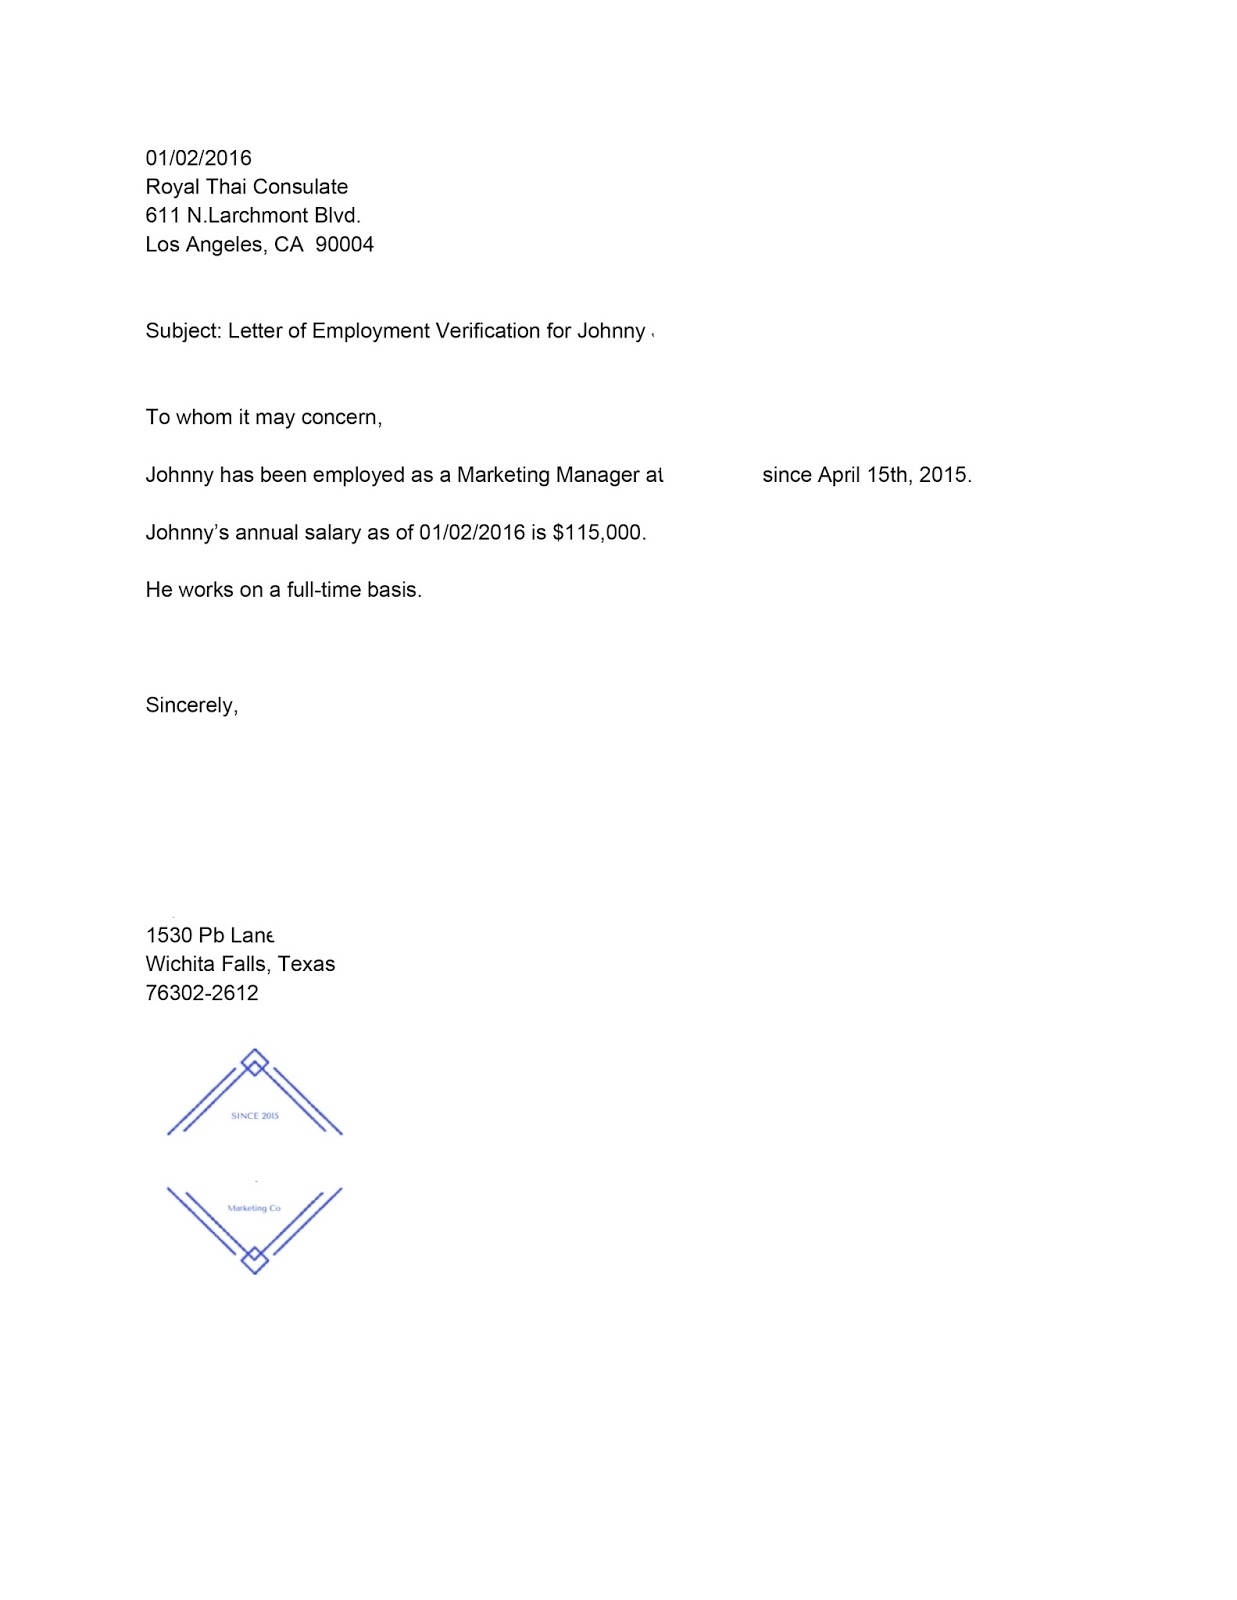 9+ Employment Verification Letter For Visitor Visa | Resumete in Letter For Food Stamps Sample